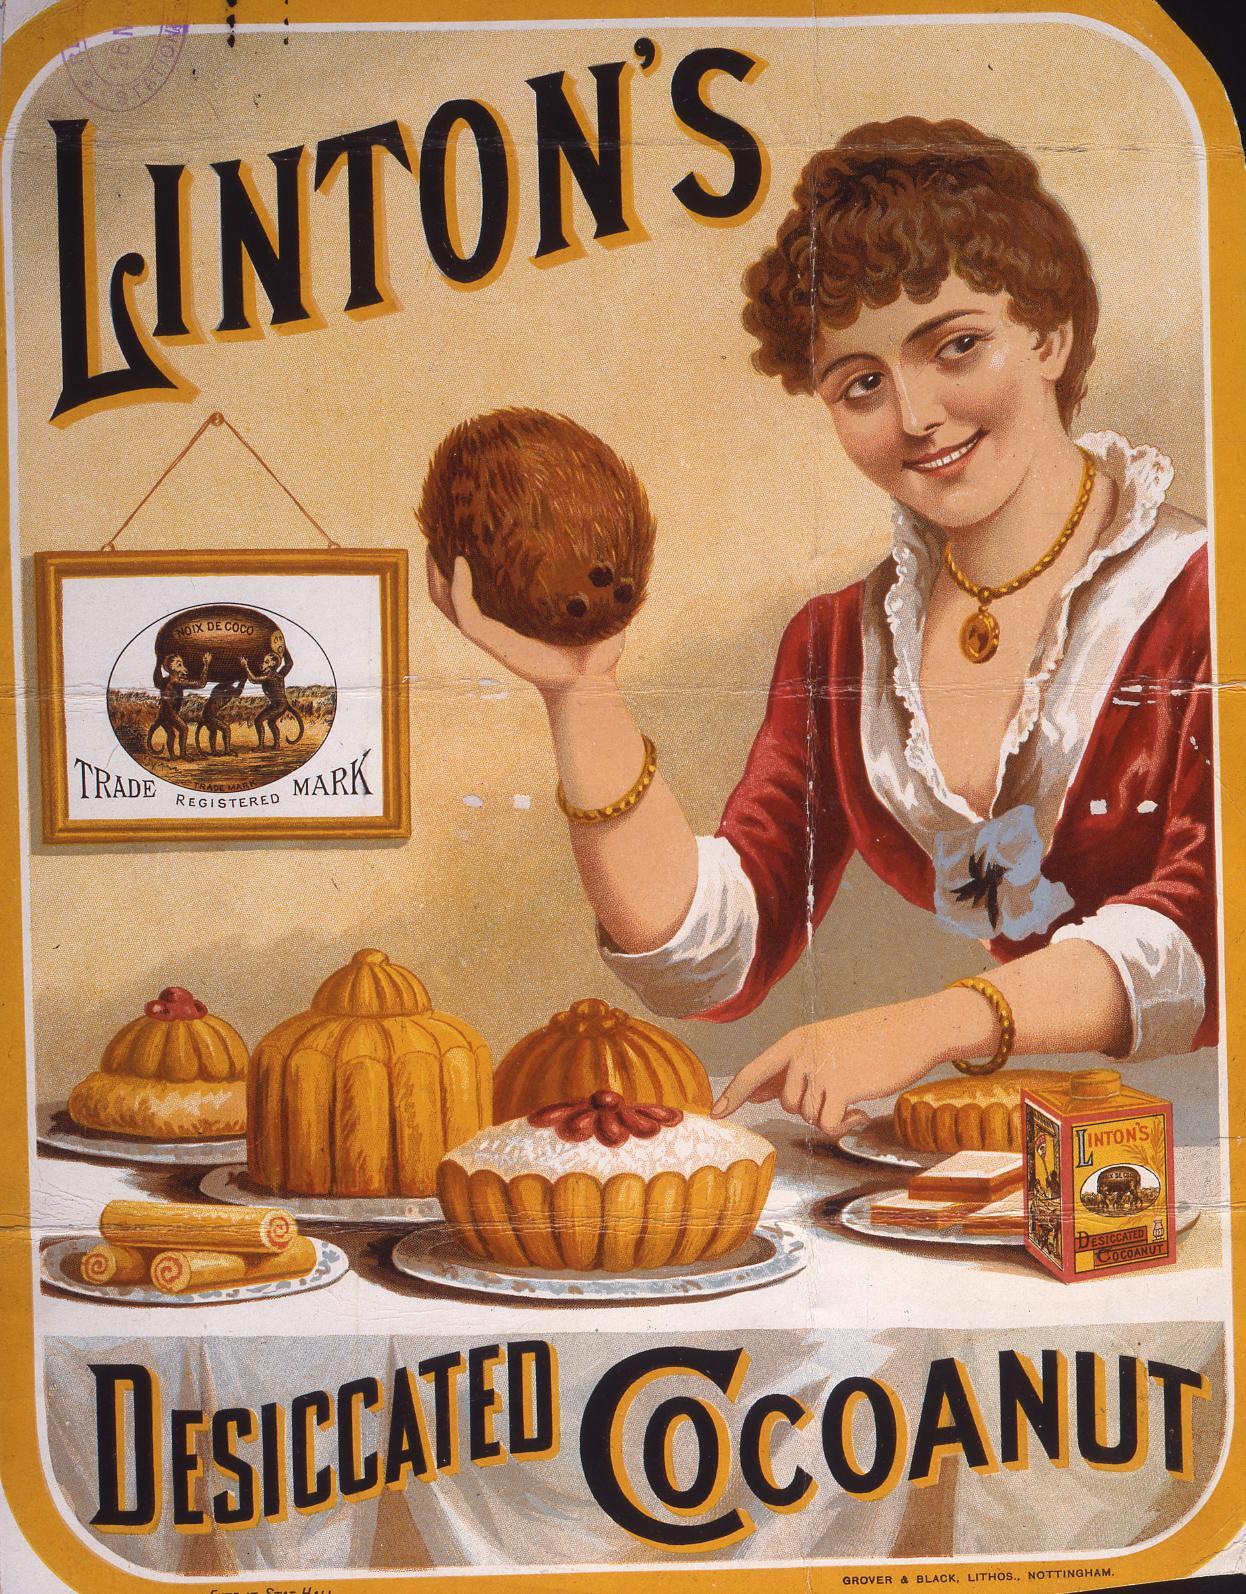 COPY 1/71 f11 1885 Linton's Desiccated Coconut